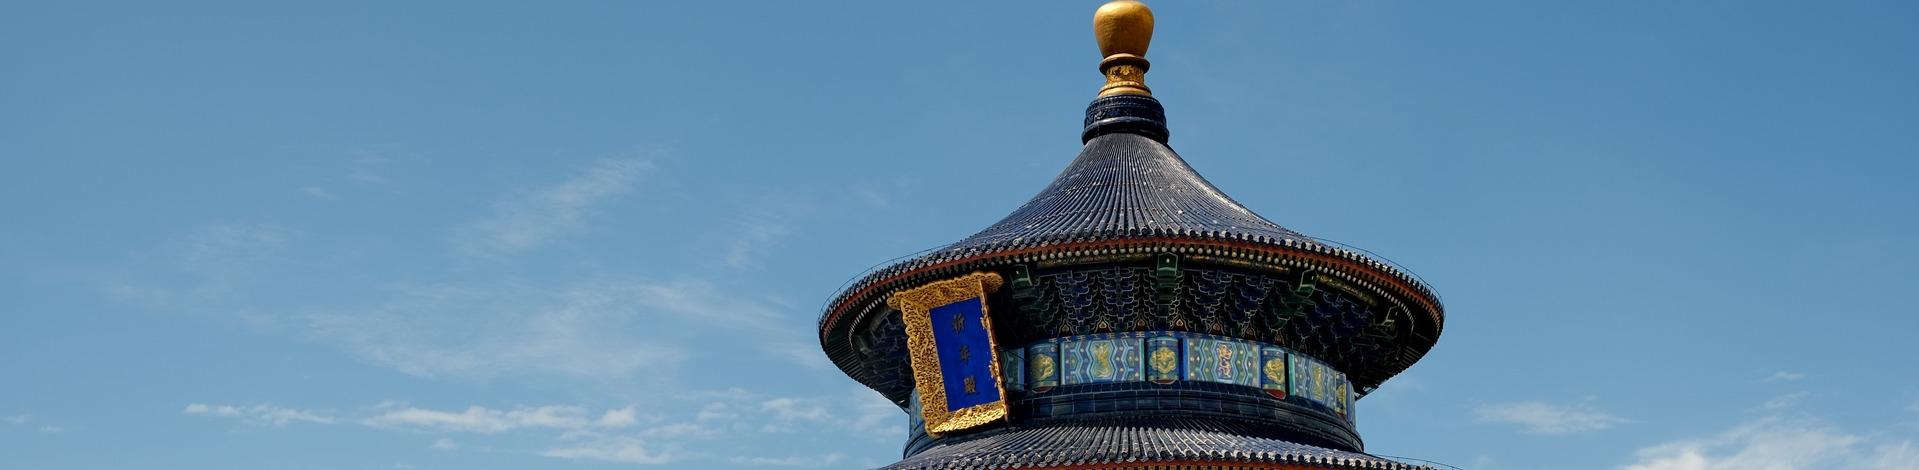 Temple ciel Pékin Chine